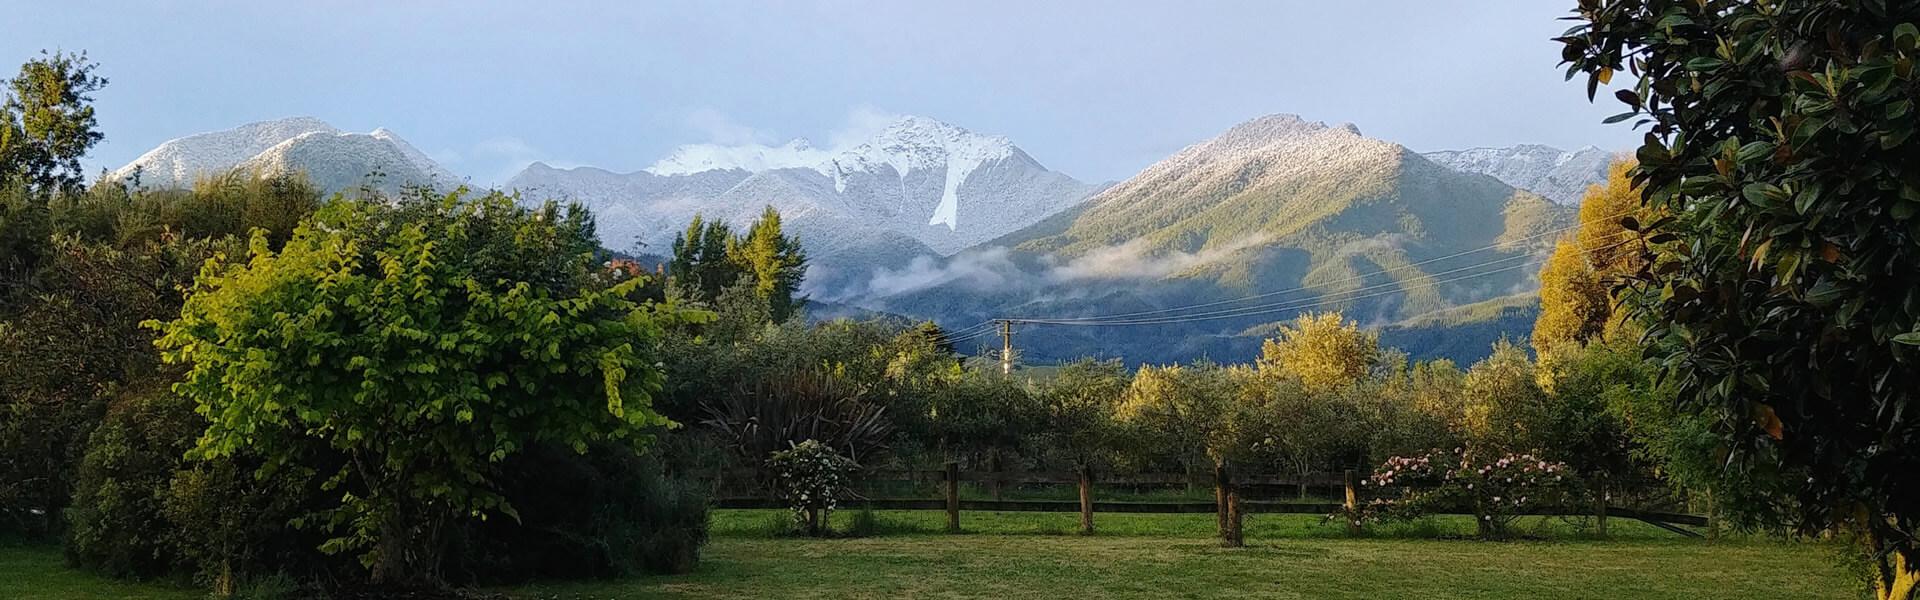 View Of Mountain Ranges Near Jeymar Soap And Body In Blenheim Marlborough NZ